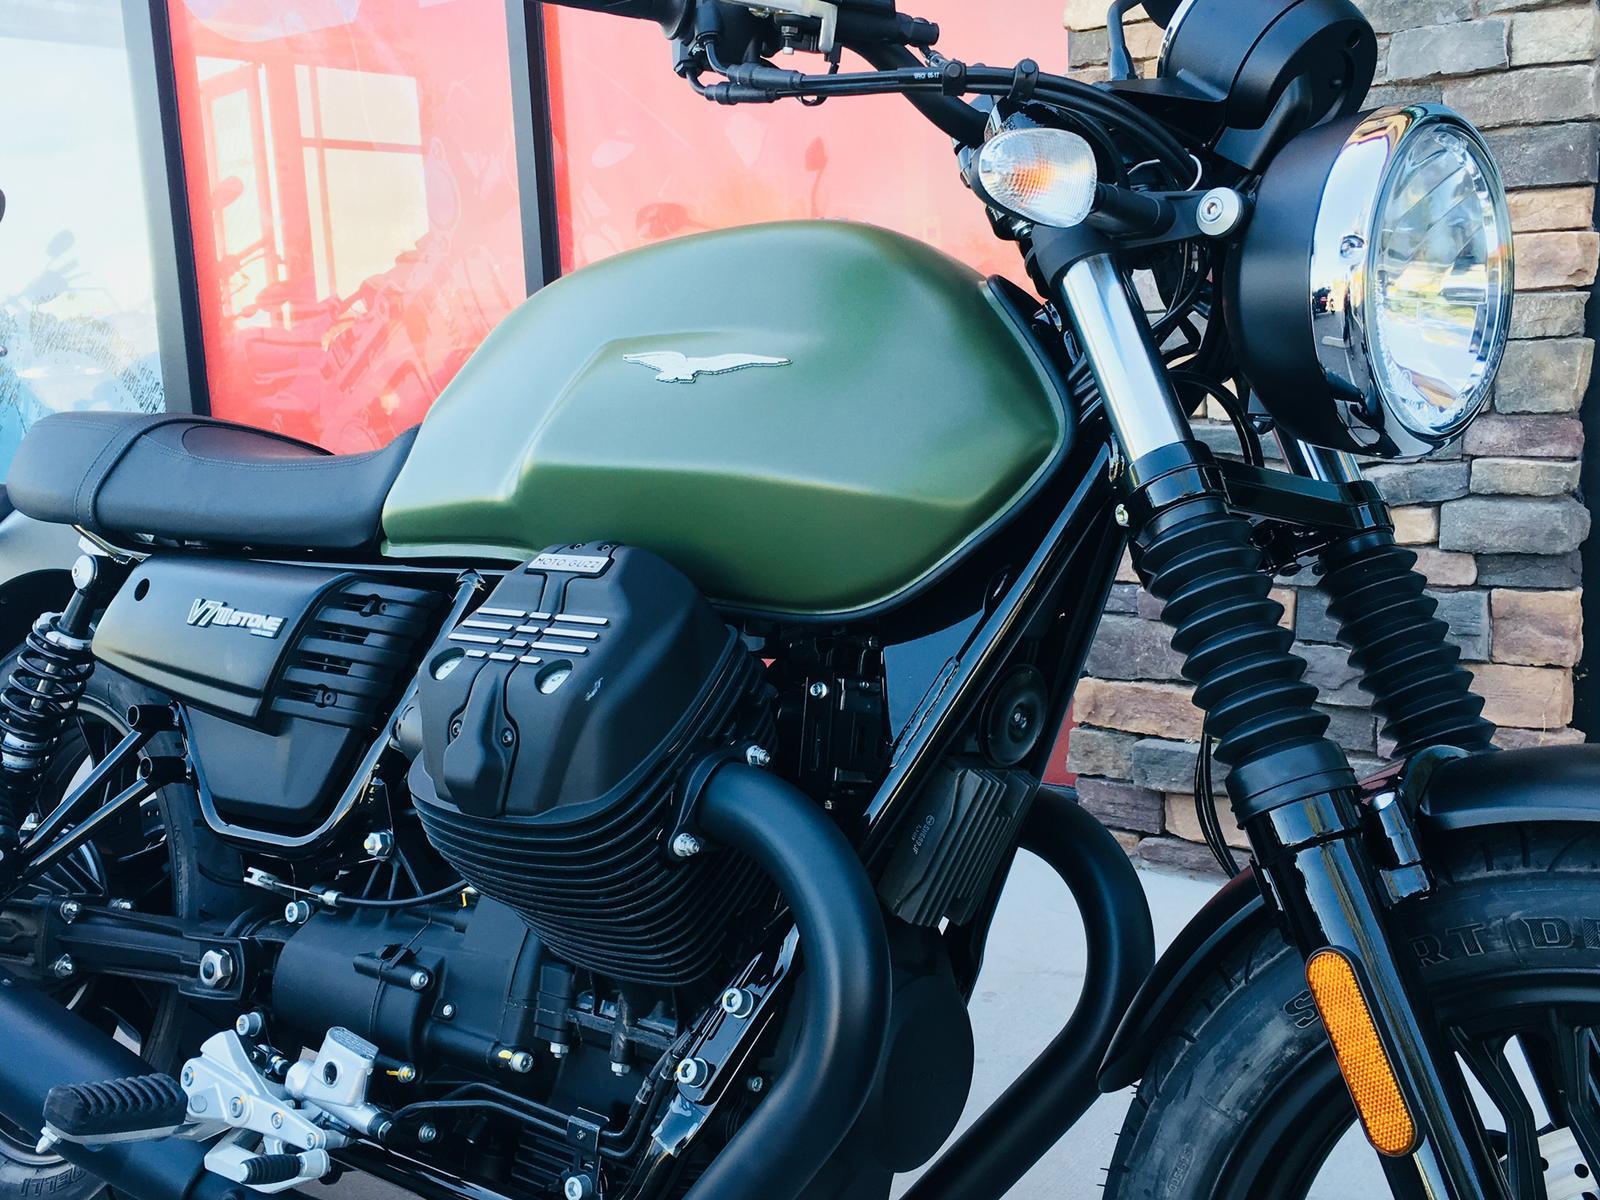 2018 Moto Guzzi V7 III STONE for sale in Las Vegas, NV